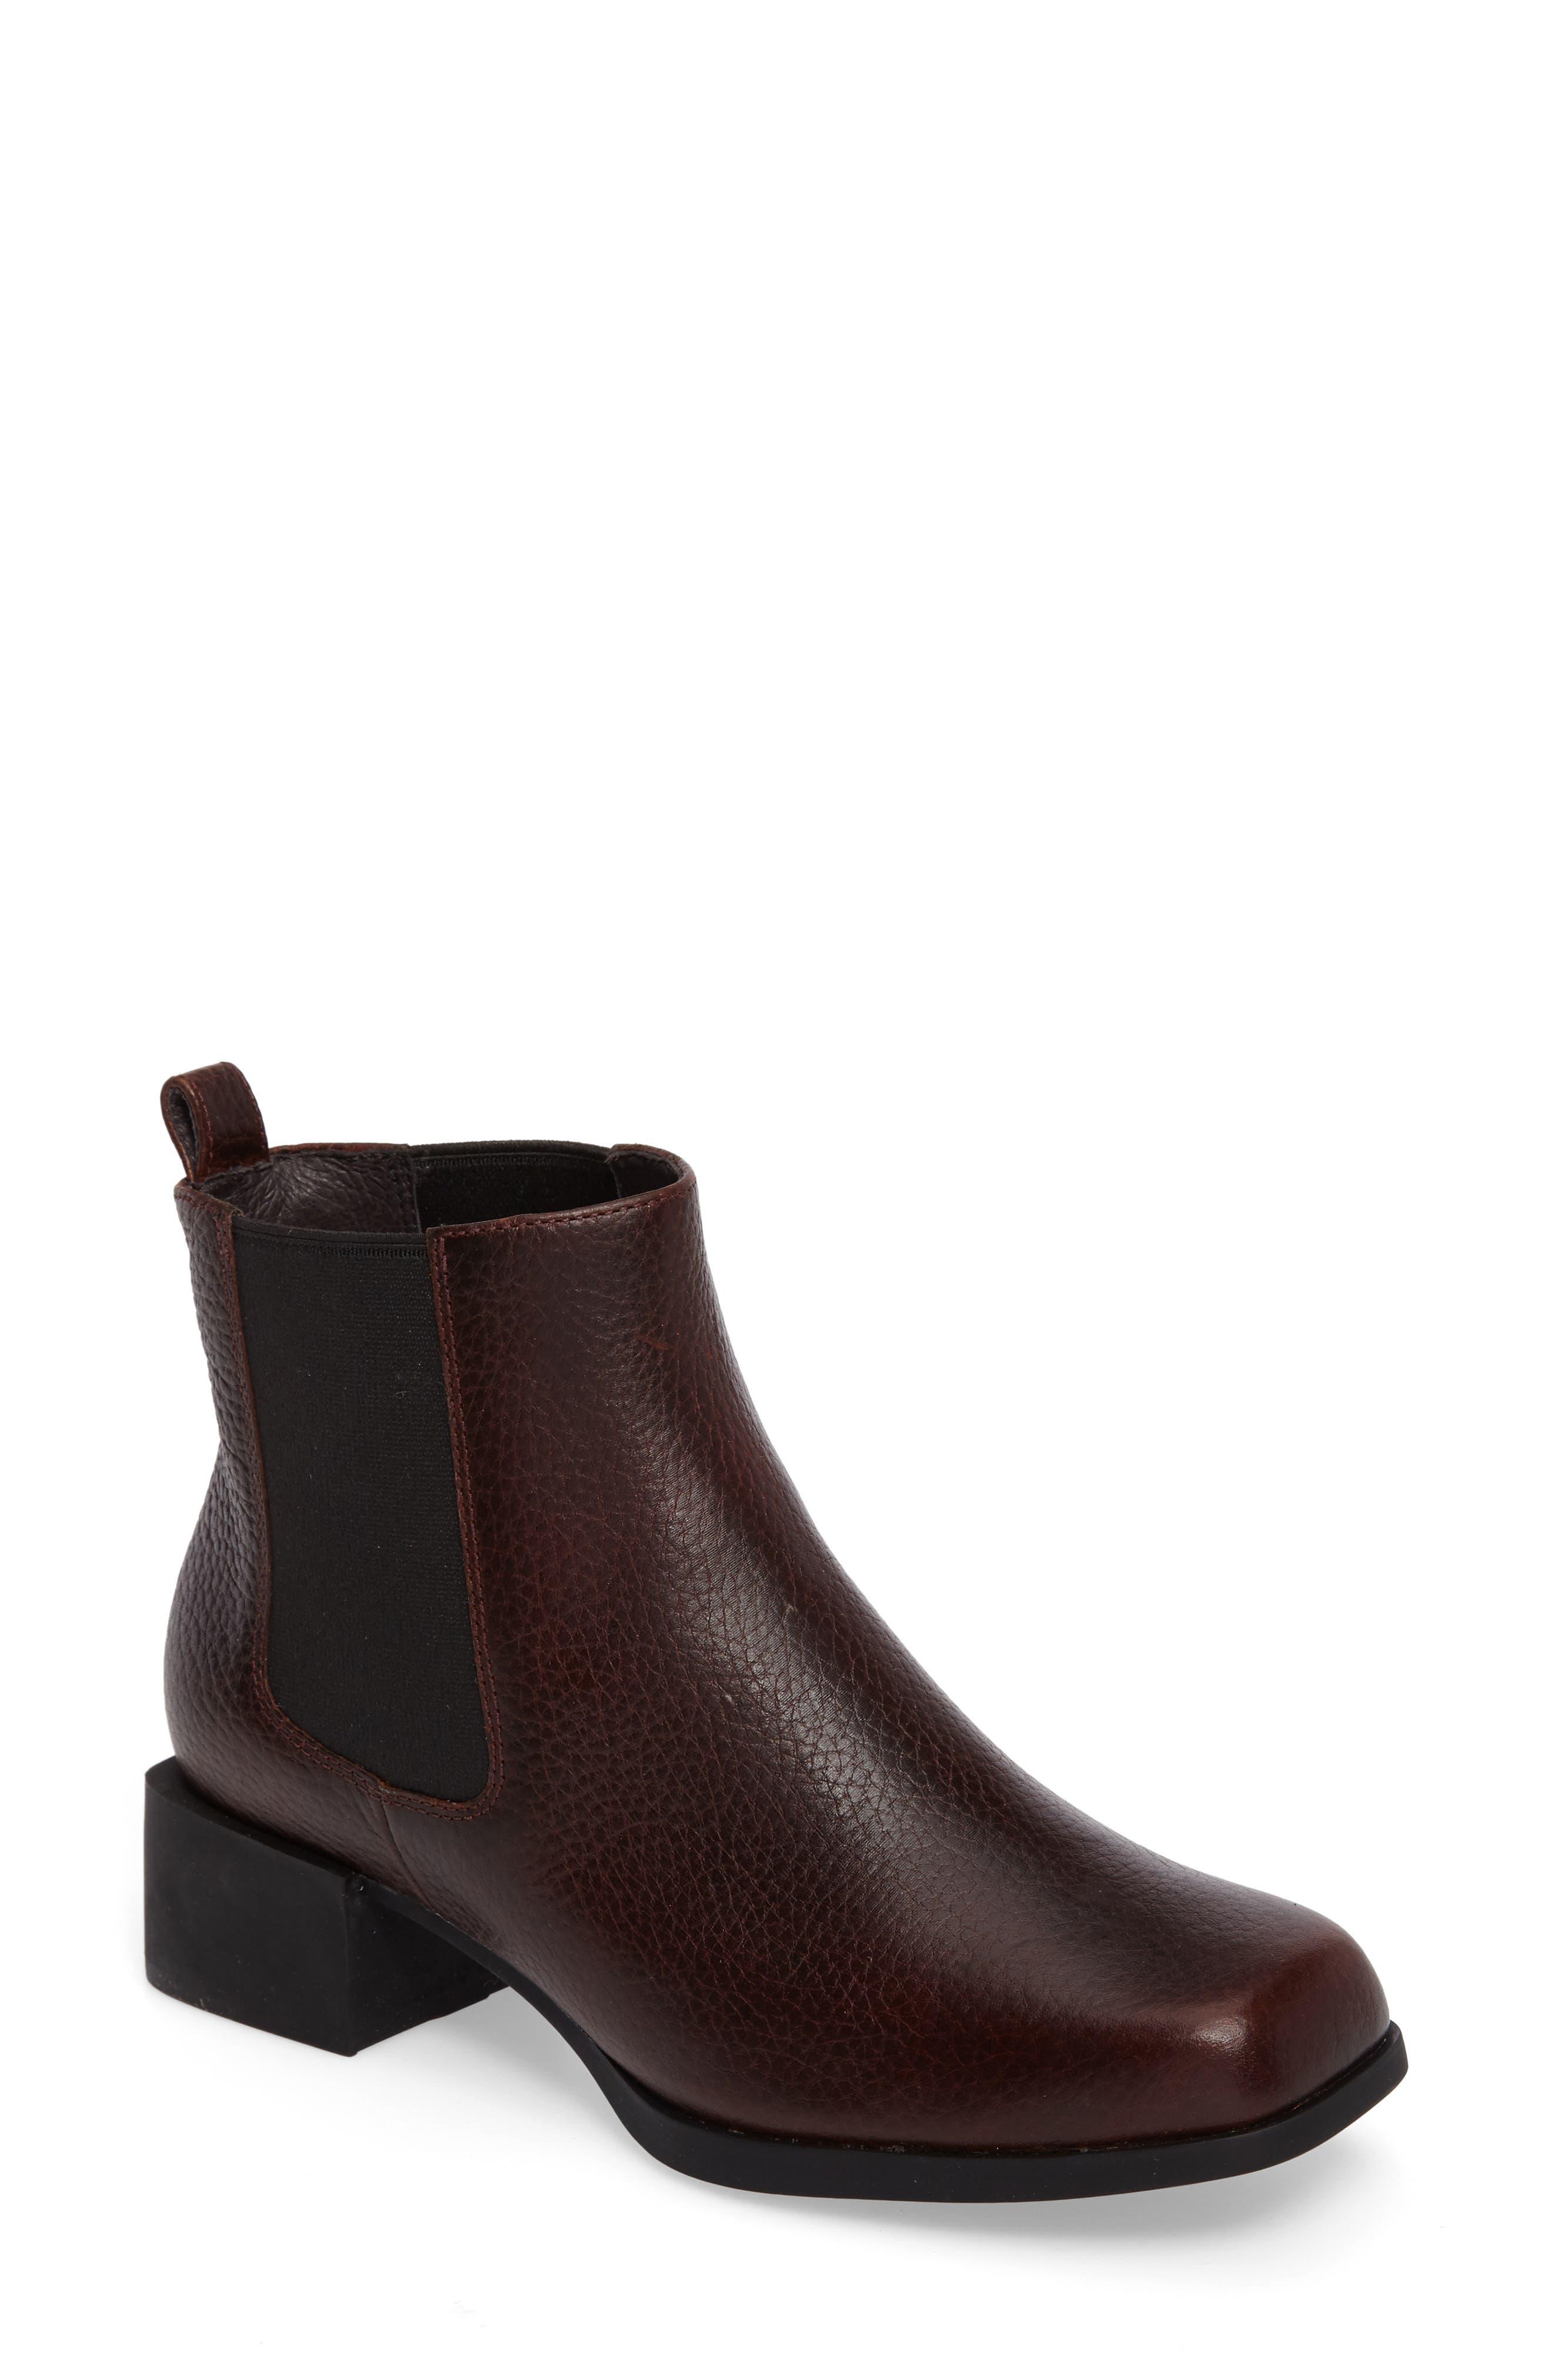 Kobo Chelsea Boot,                         Main,                         color, Medium Brown Leather